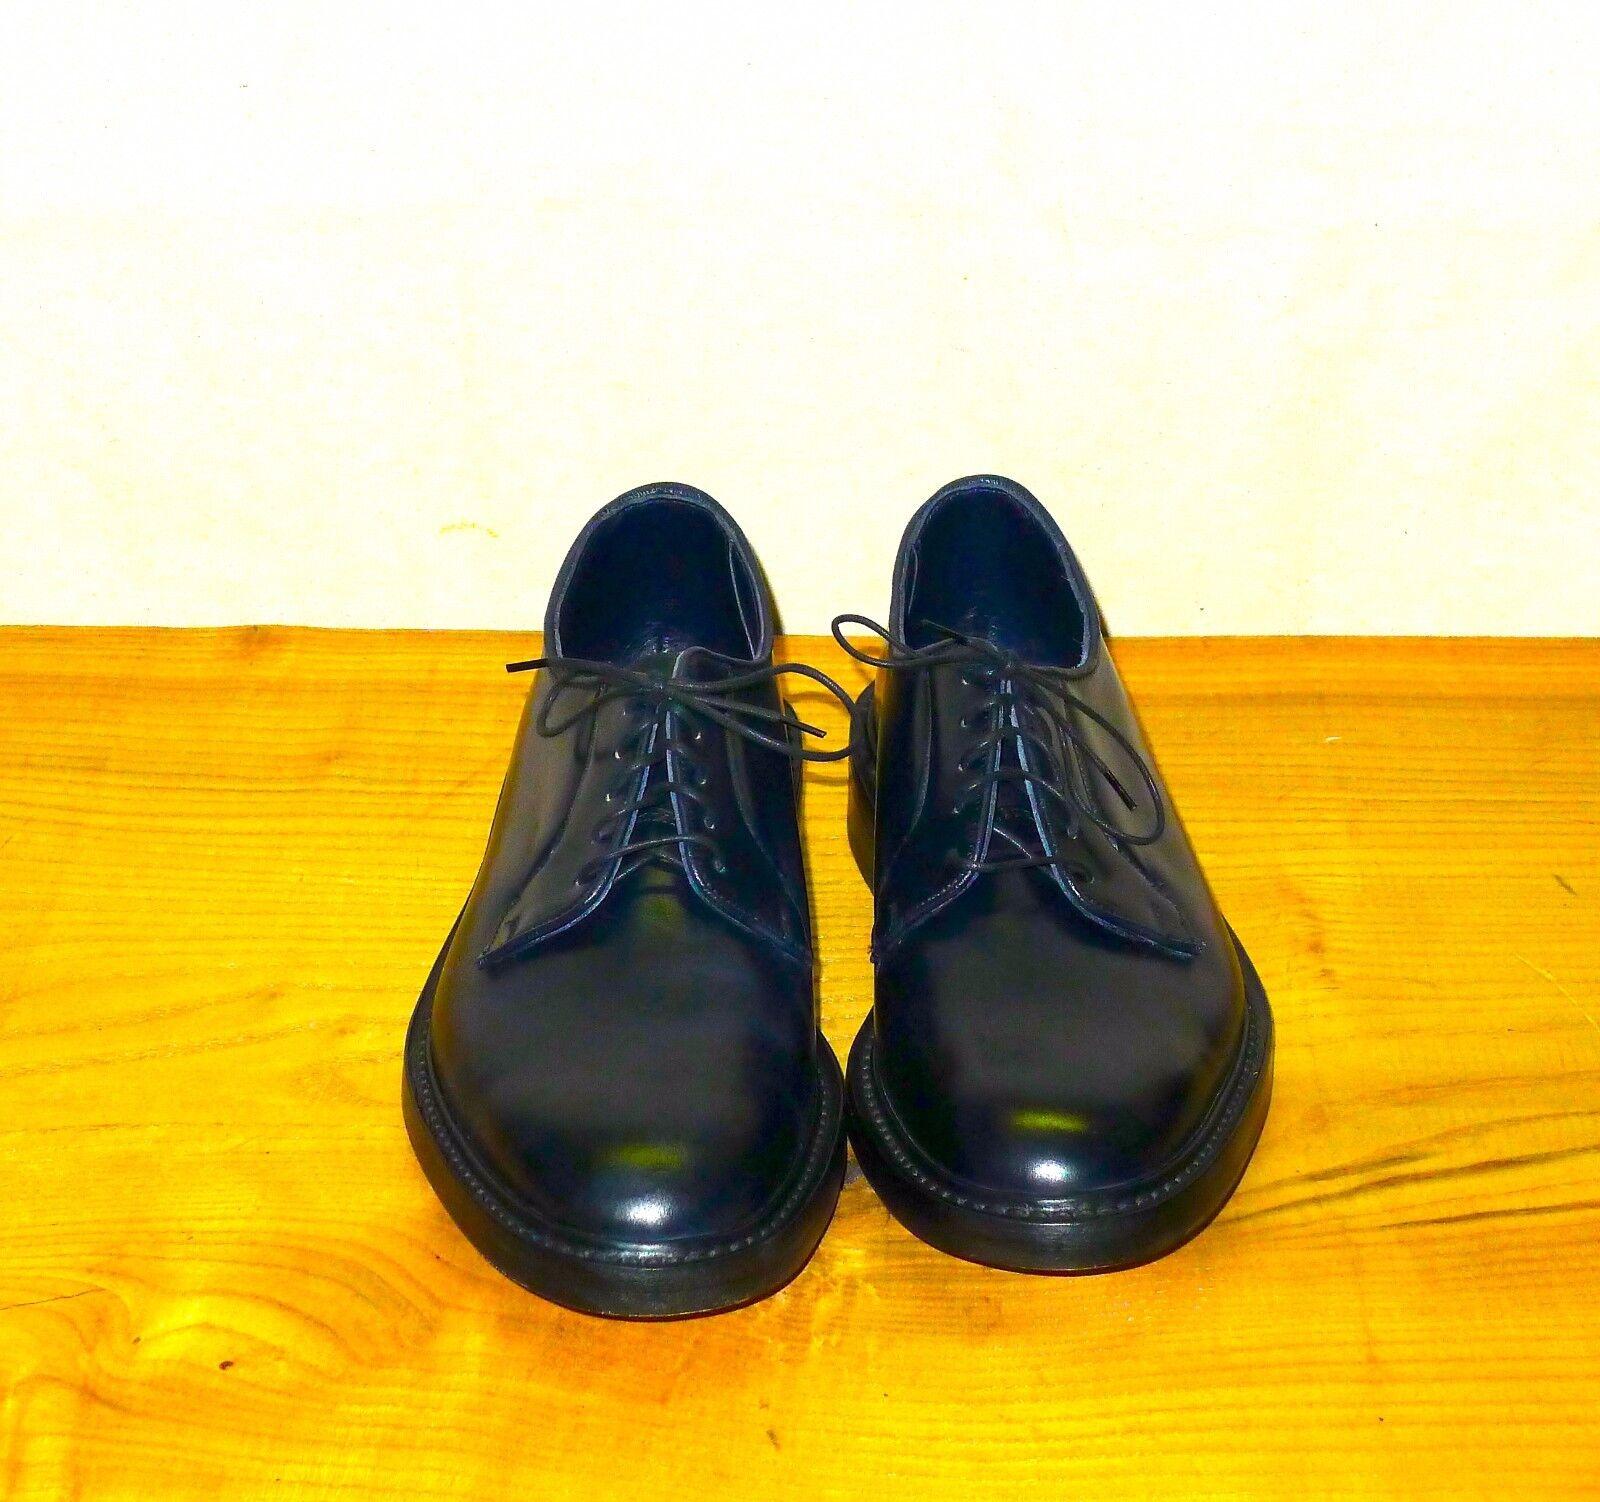 disponibile Tricker's Uomo Dark blu  Cordovan Robert Derby scarpe (Various (Various (Various UK Dimensiones) NIB  senza esitazione! acquista ora!